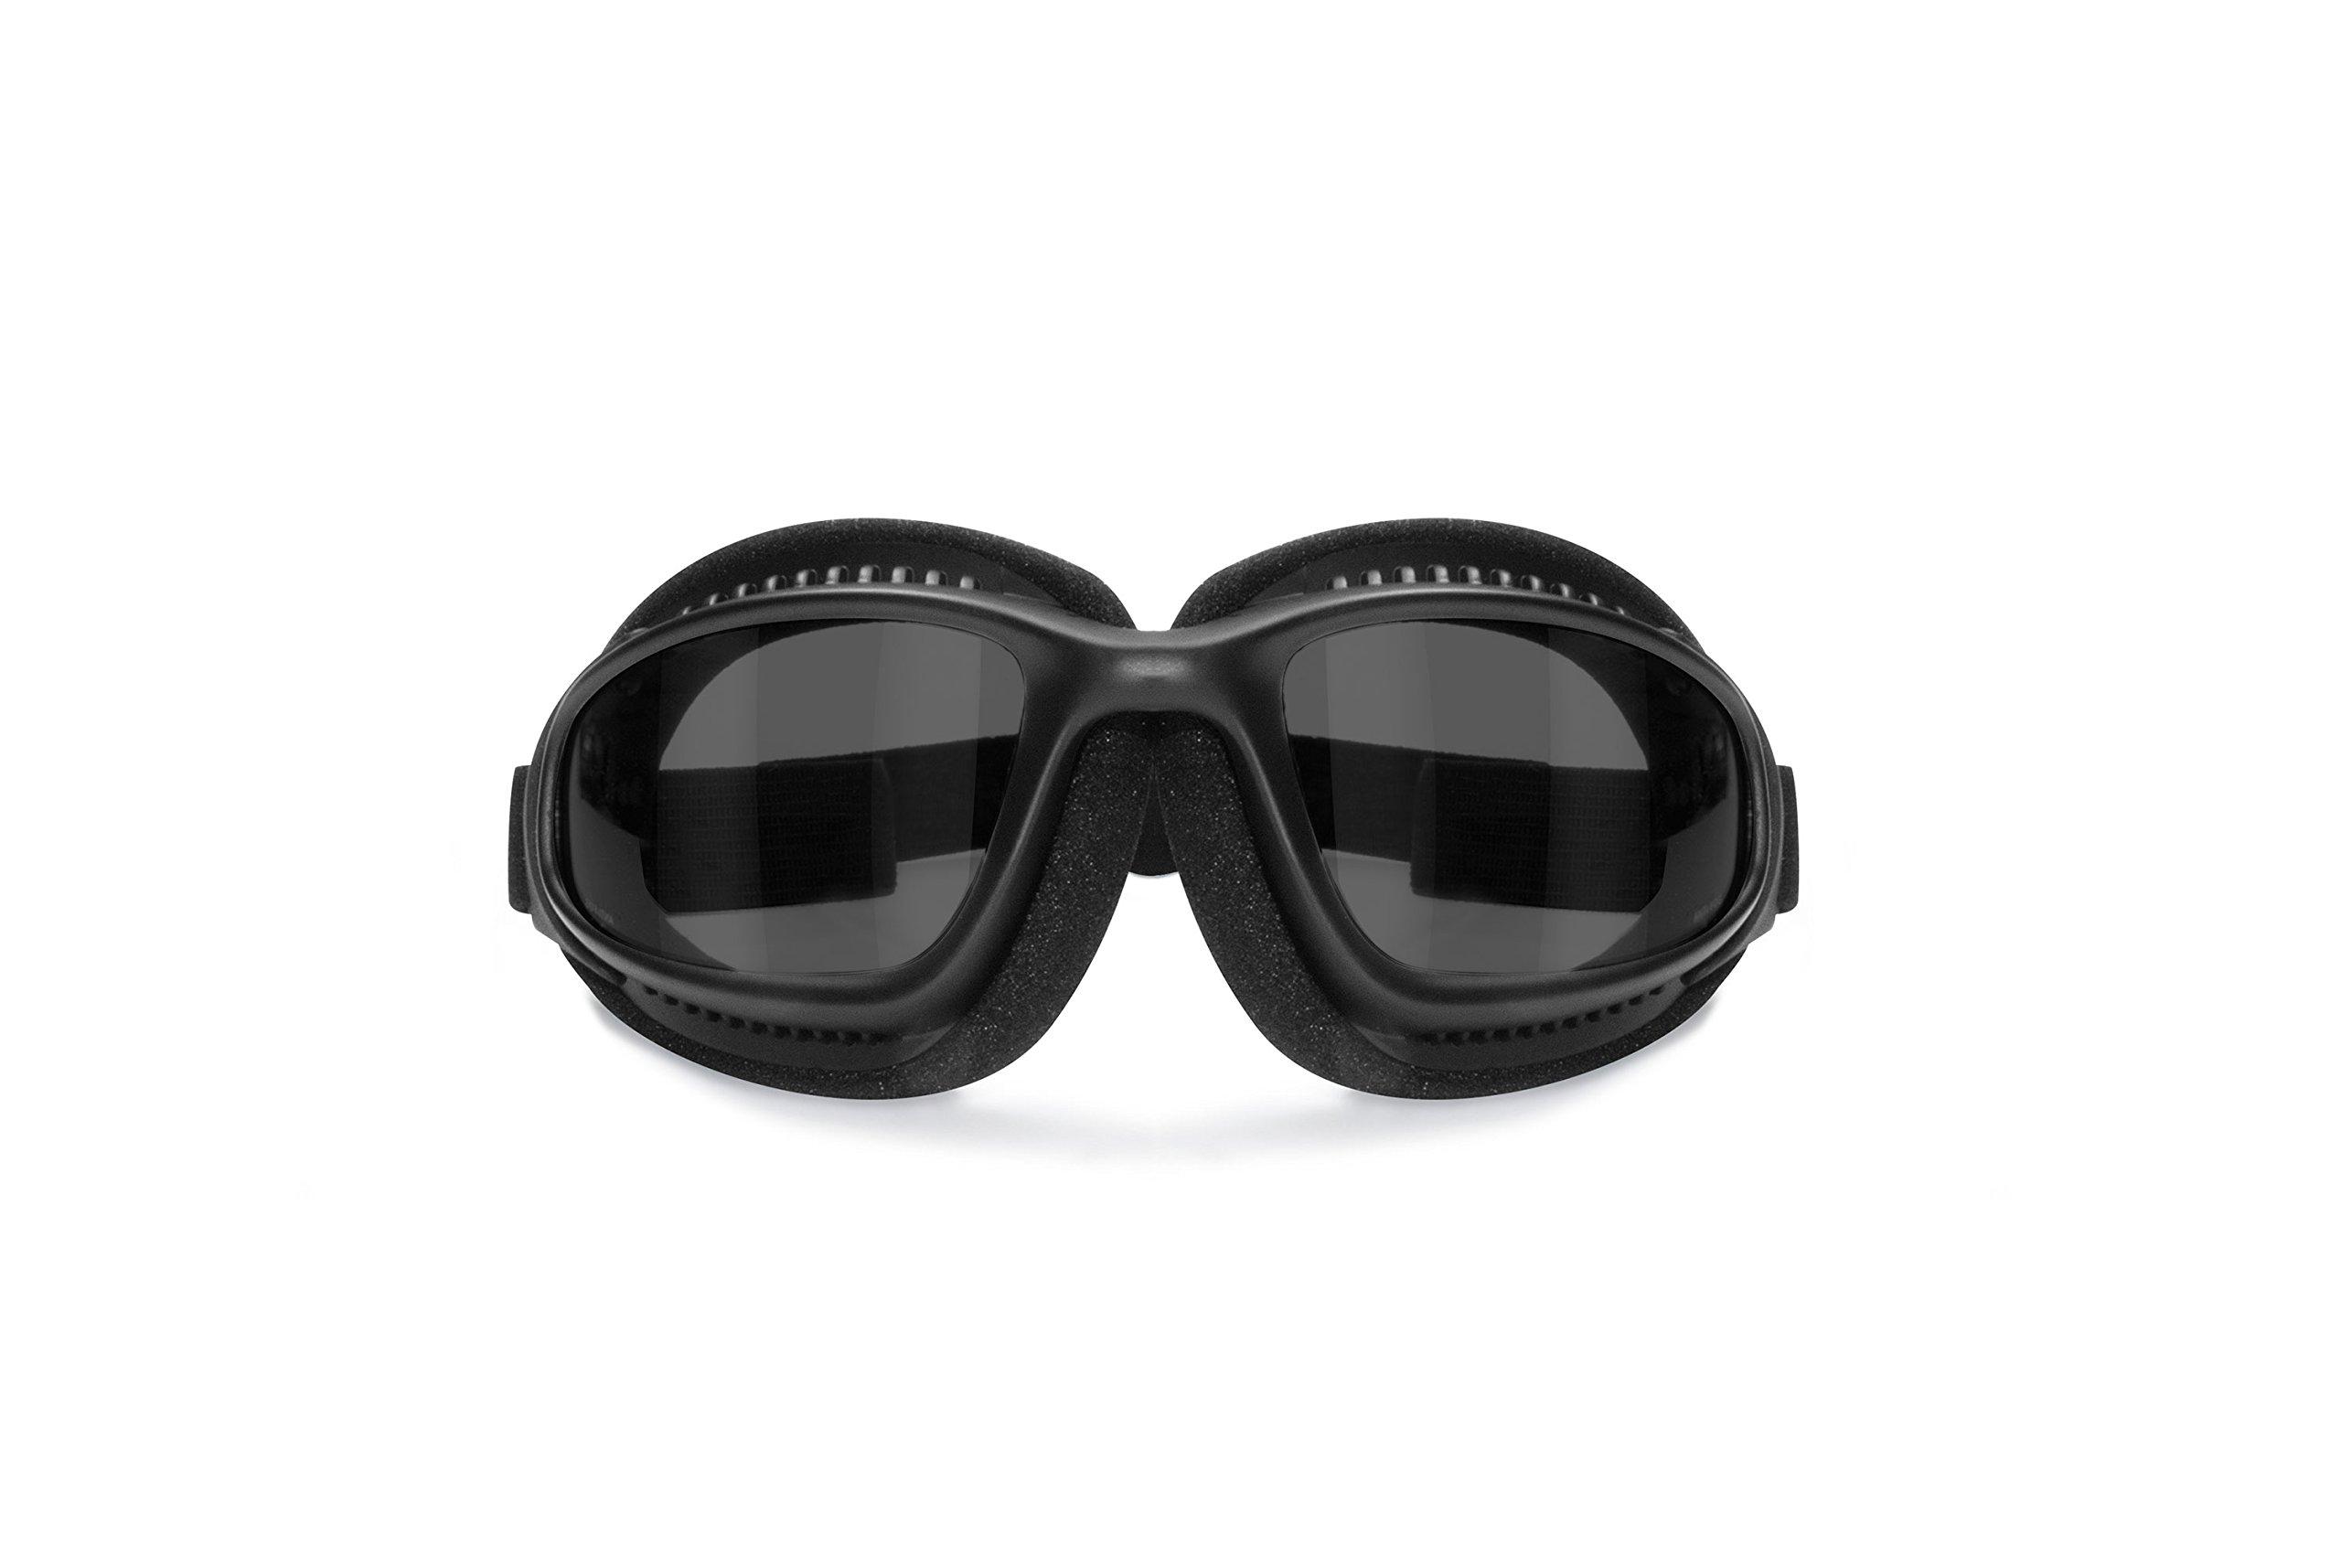 Masque moto Bertoni AF113 2